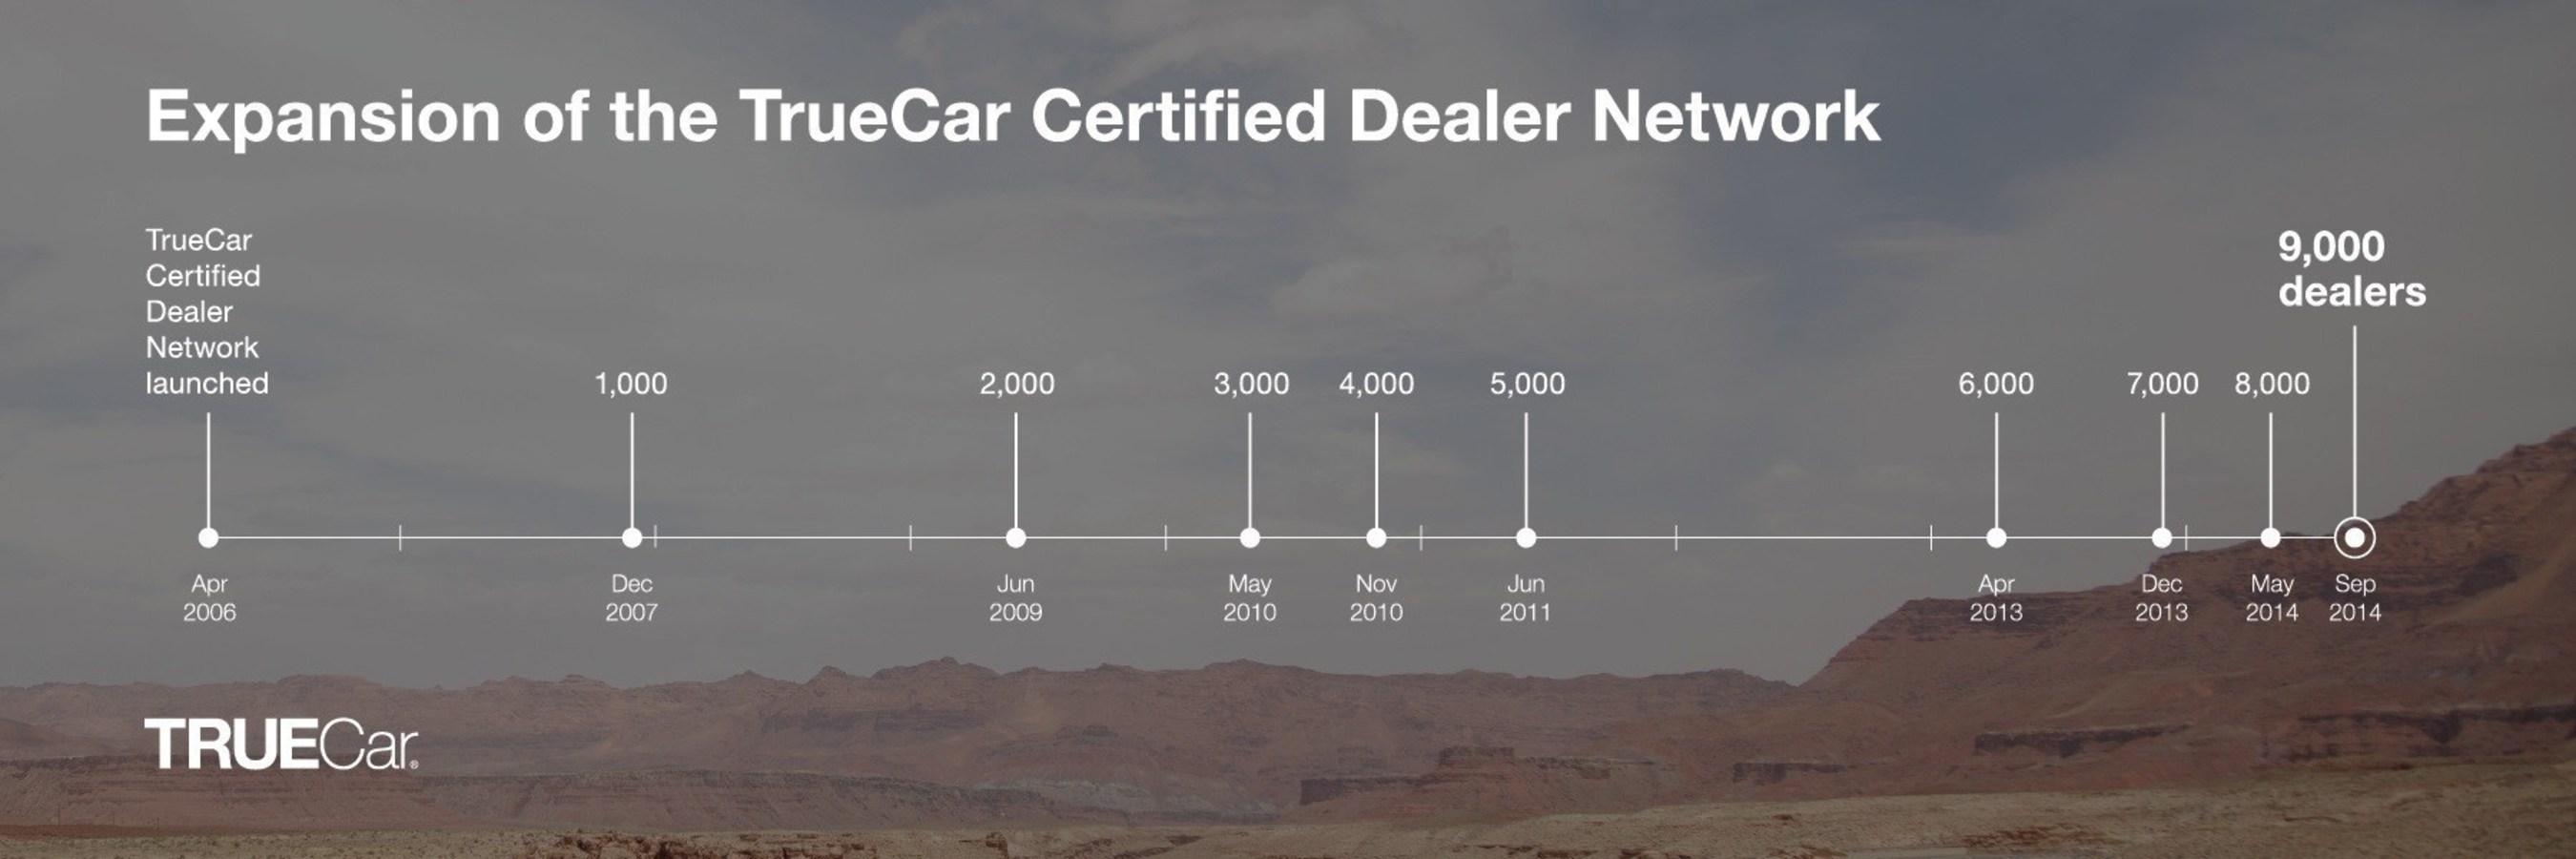 truecar certified dealer network reaches all time high 9 000 dealers. Black Bedroom Furniture Sets. Home Design Ideas